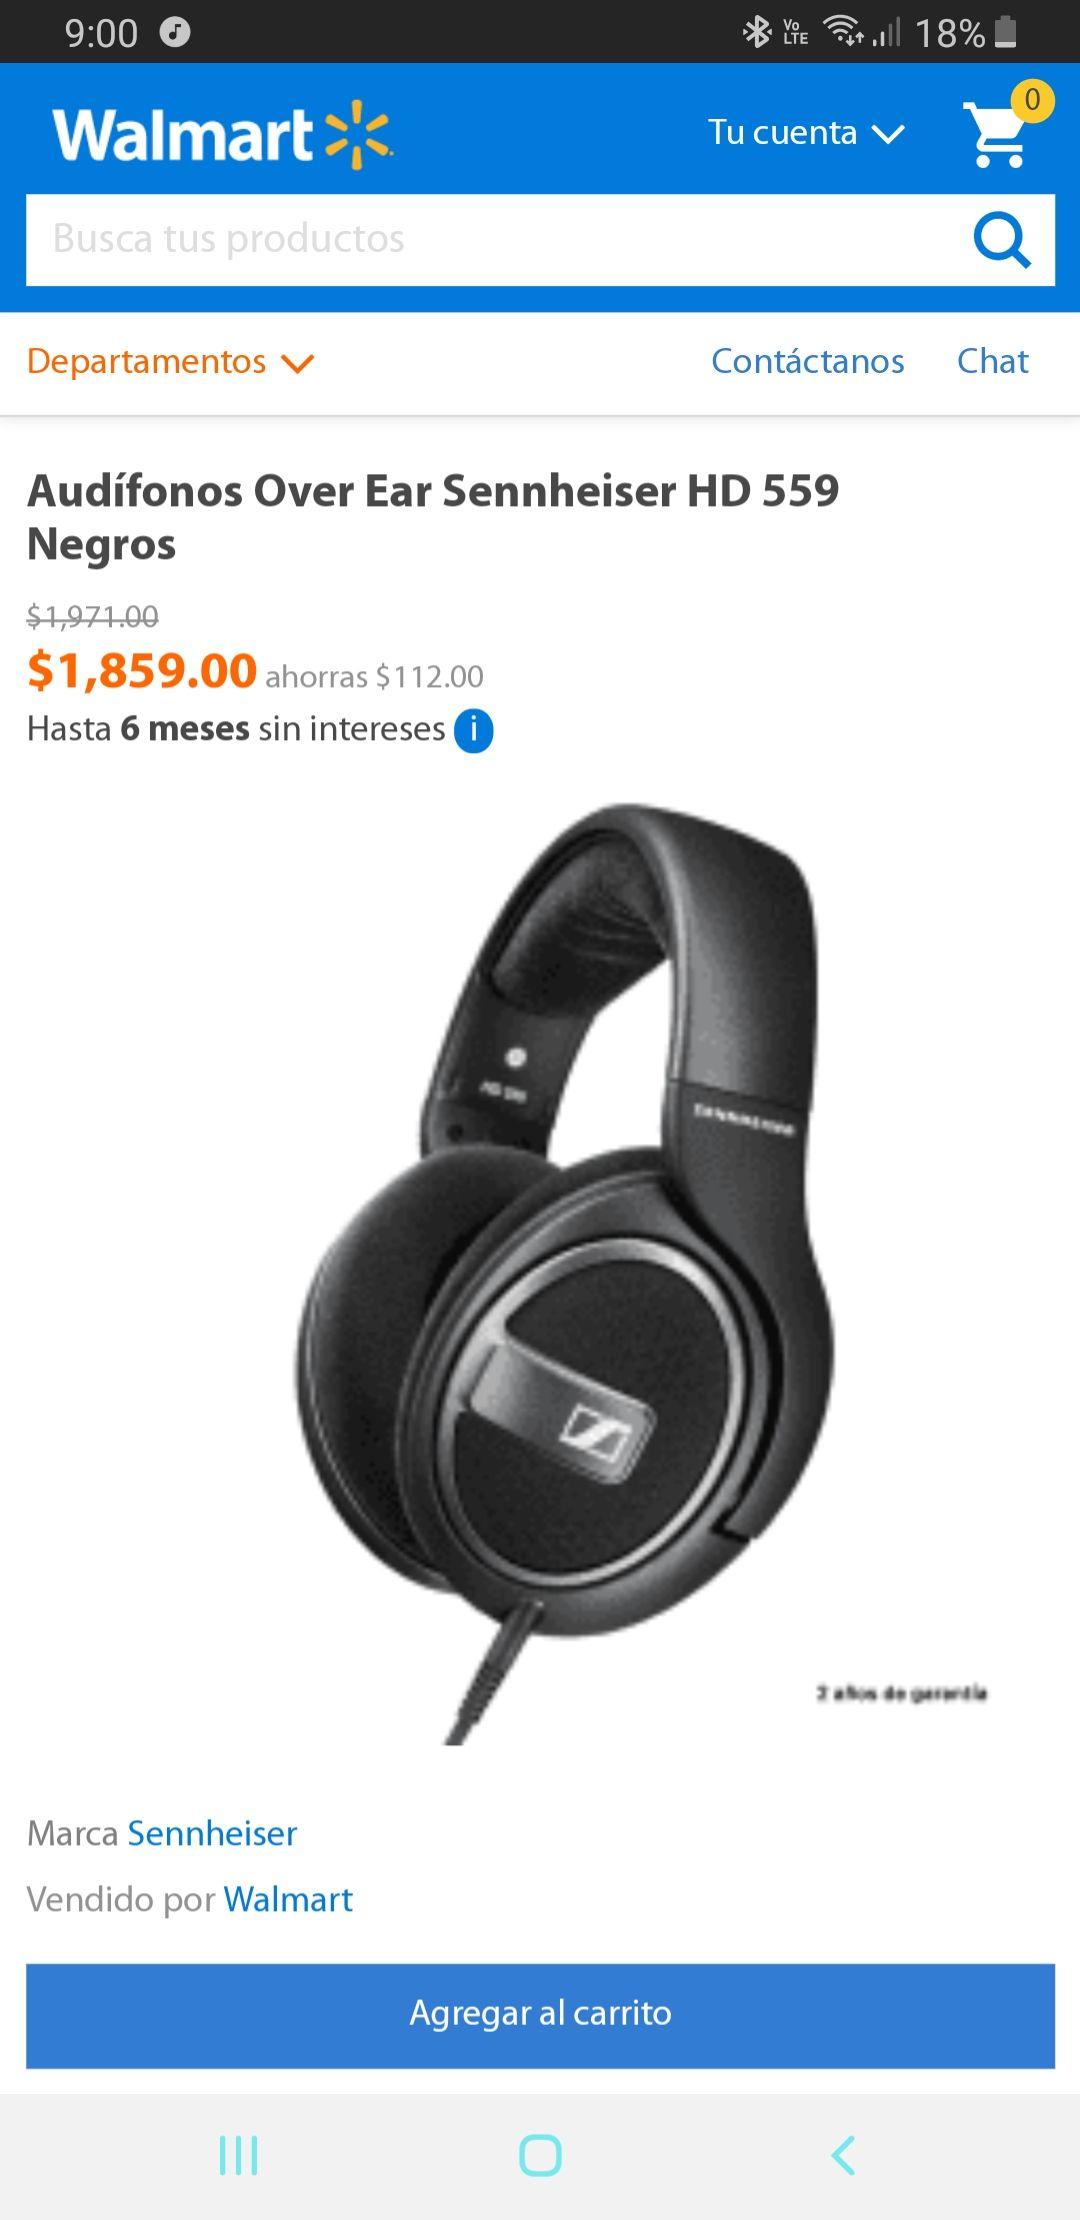 Walmart en línea: Seinheiser hd 599 $1859